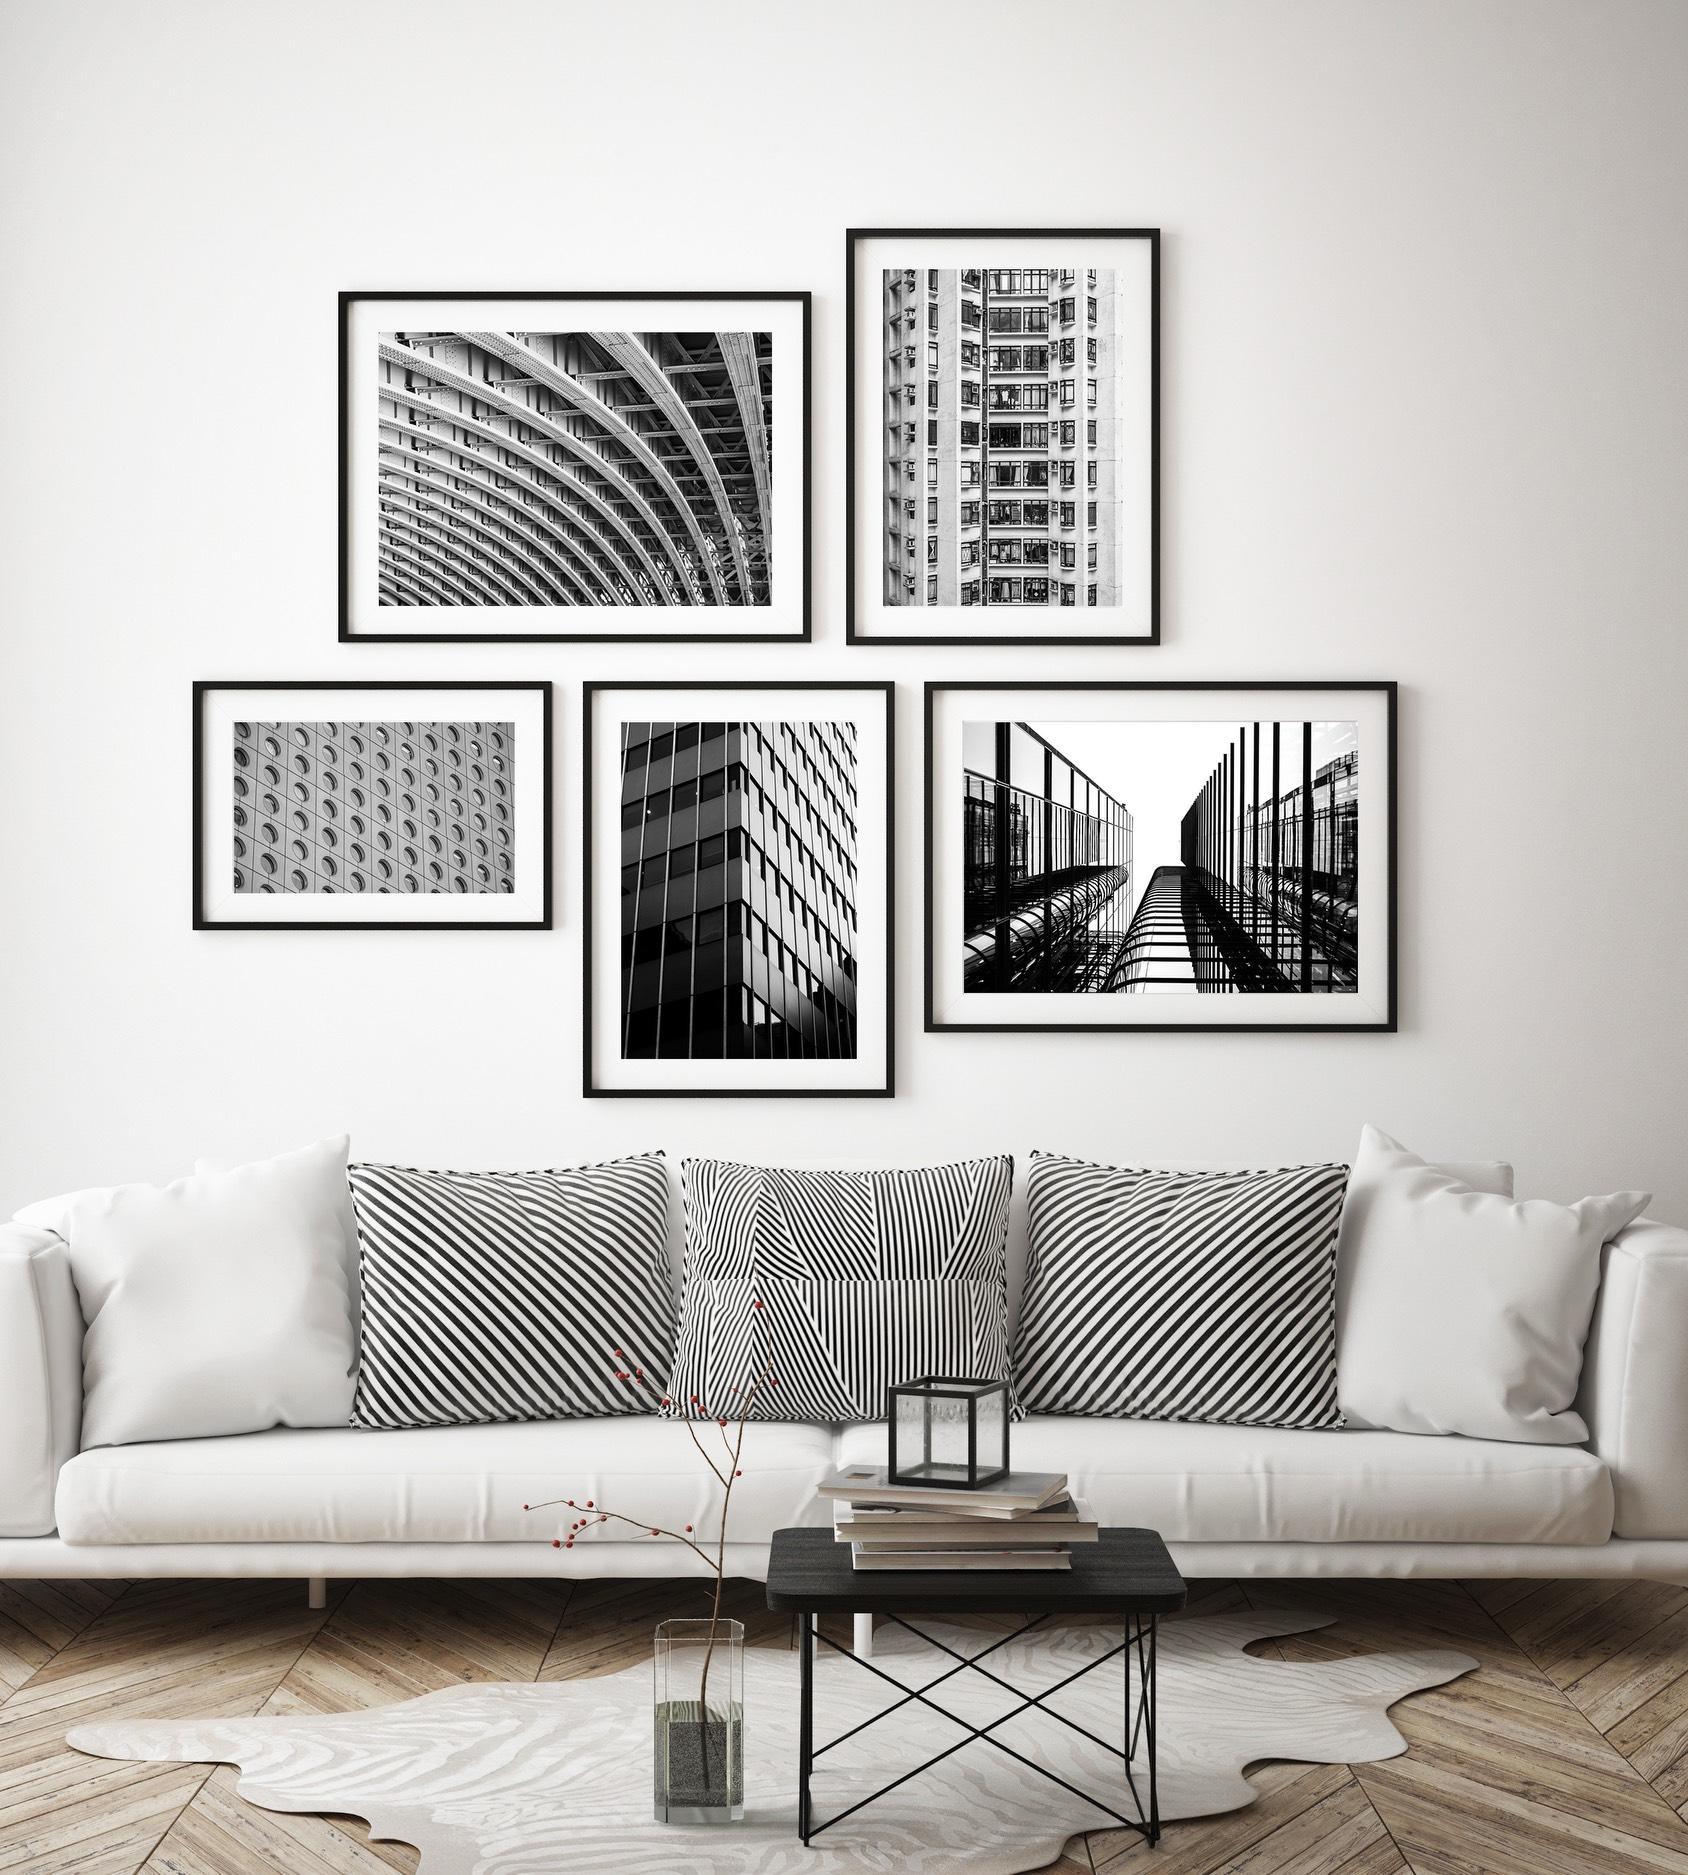 Circles and Lines - London and Hong Kong Wall Art - Gallery Wall Collection of 5 prints